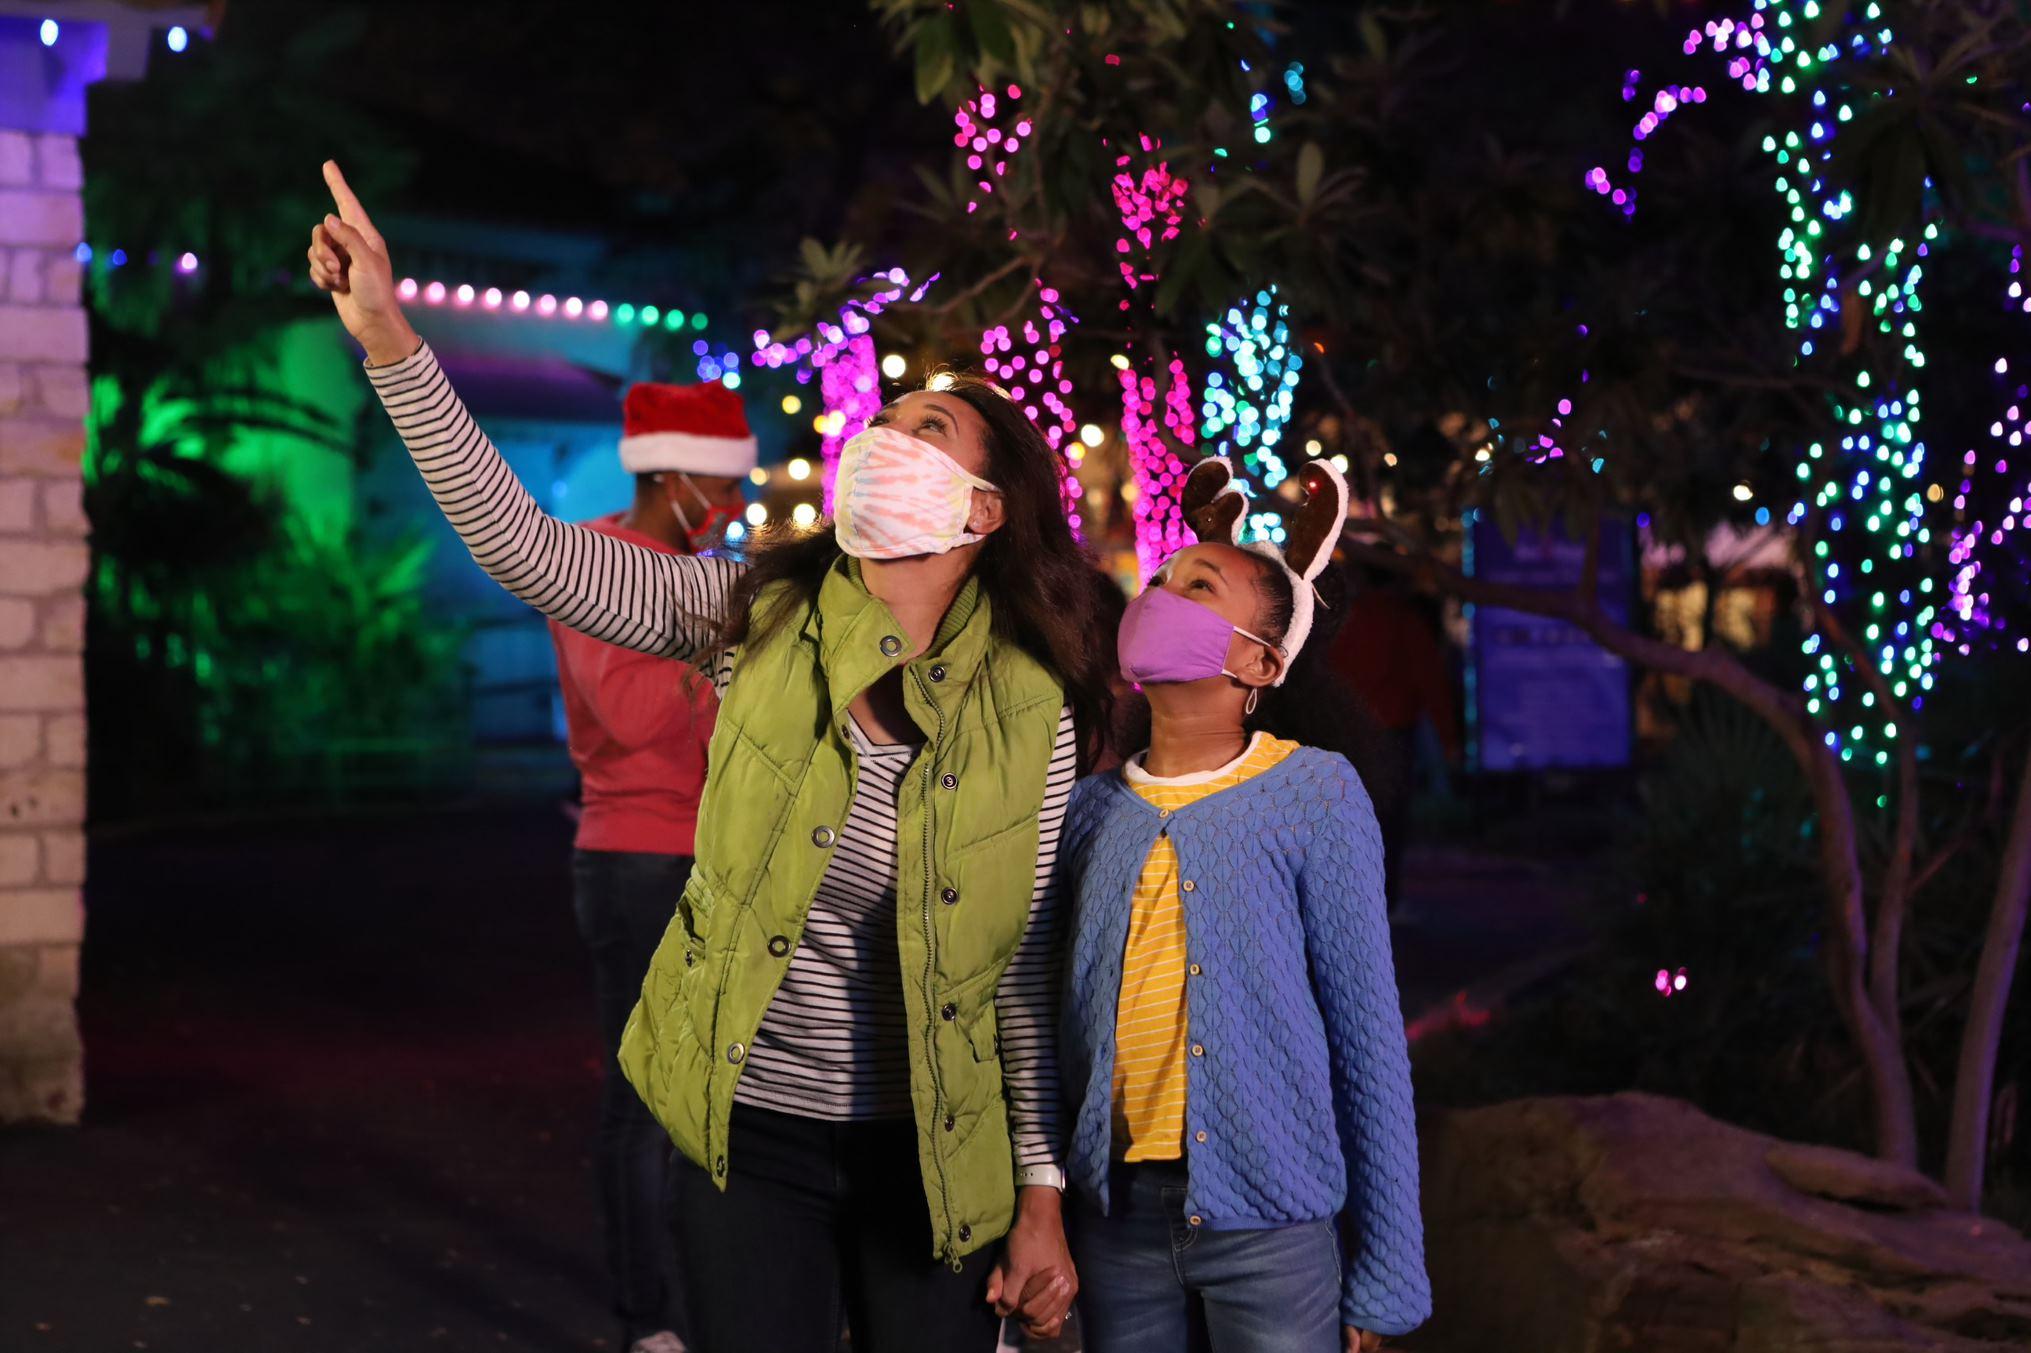 Where Can I Drive To See Neighborhood Christmas Lights Near Puyallup Washington 2021 Where To See Festive Holiday Light Displays Around Washington